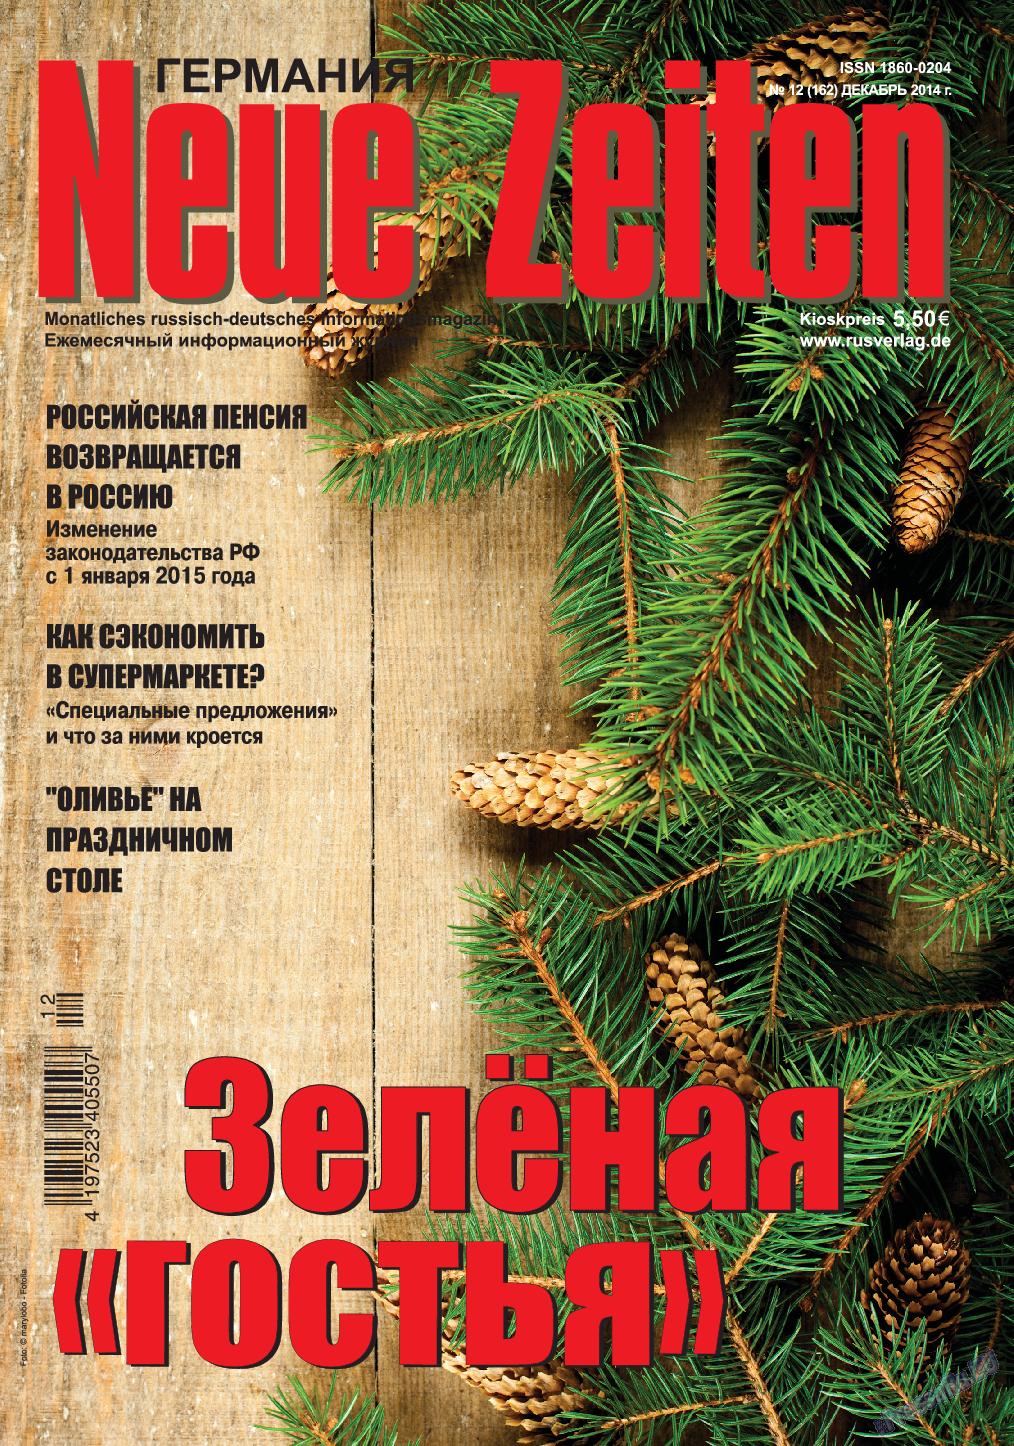 Neue Zeiten (журнал). 2014 год, номер 12, стр. 1